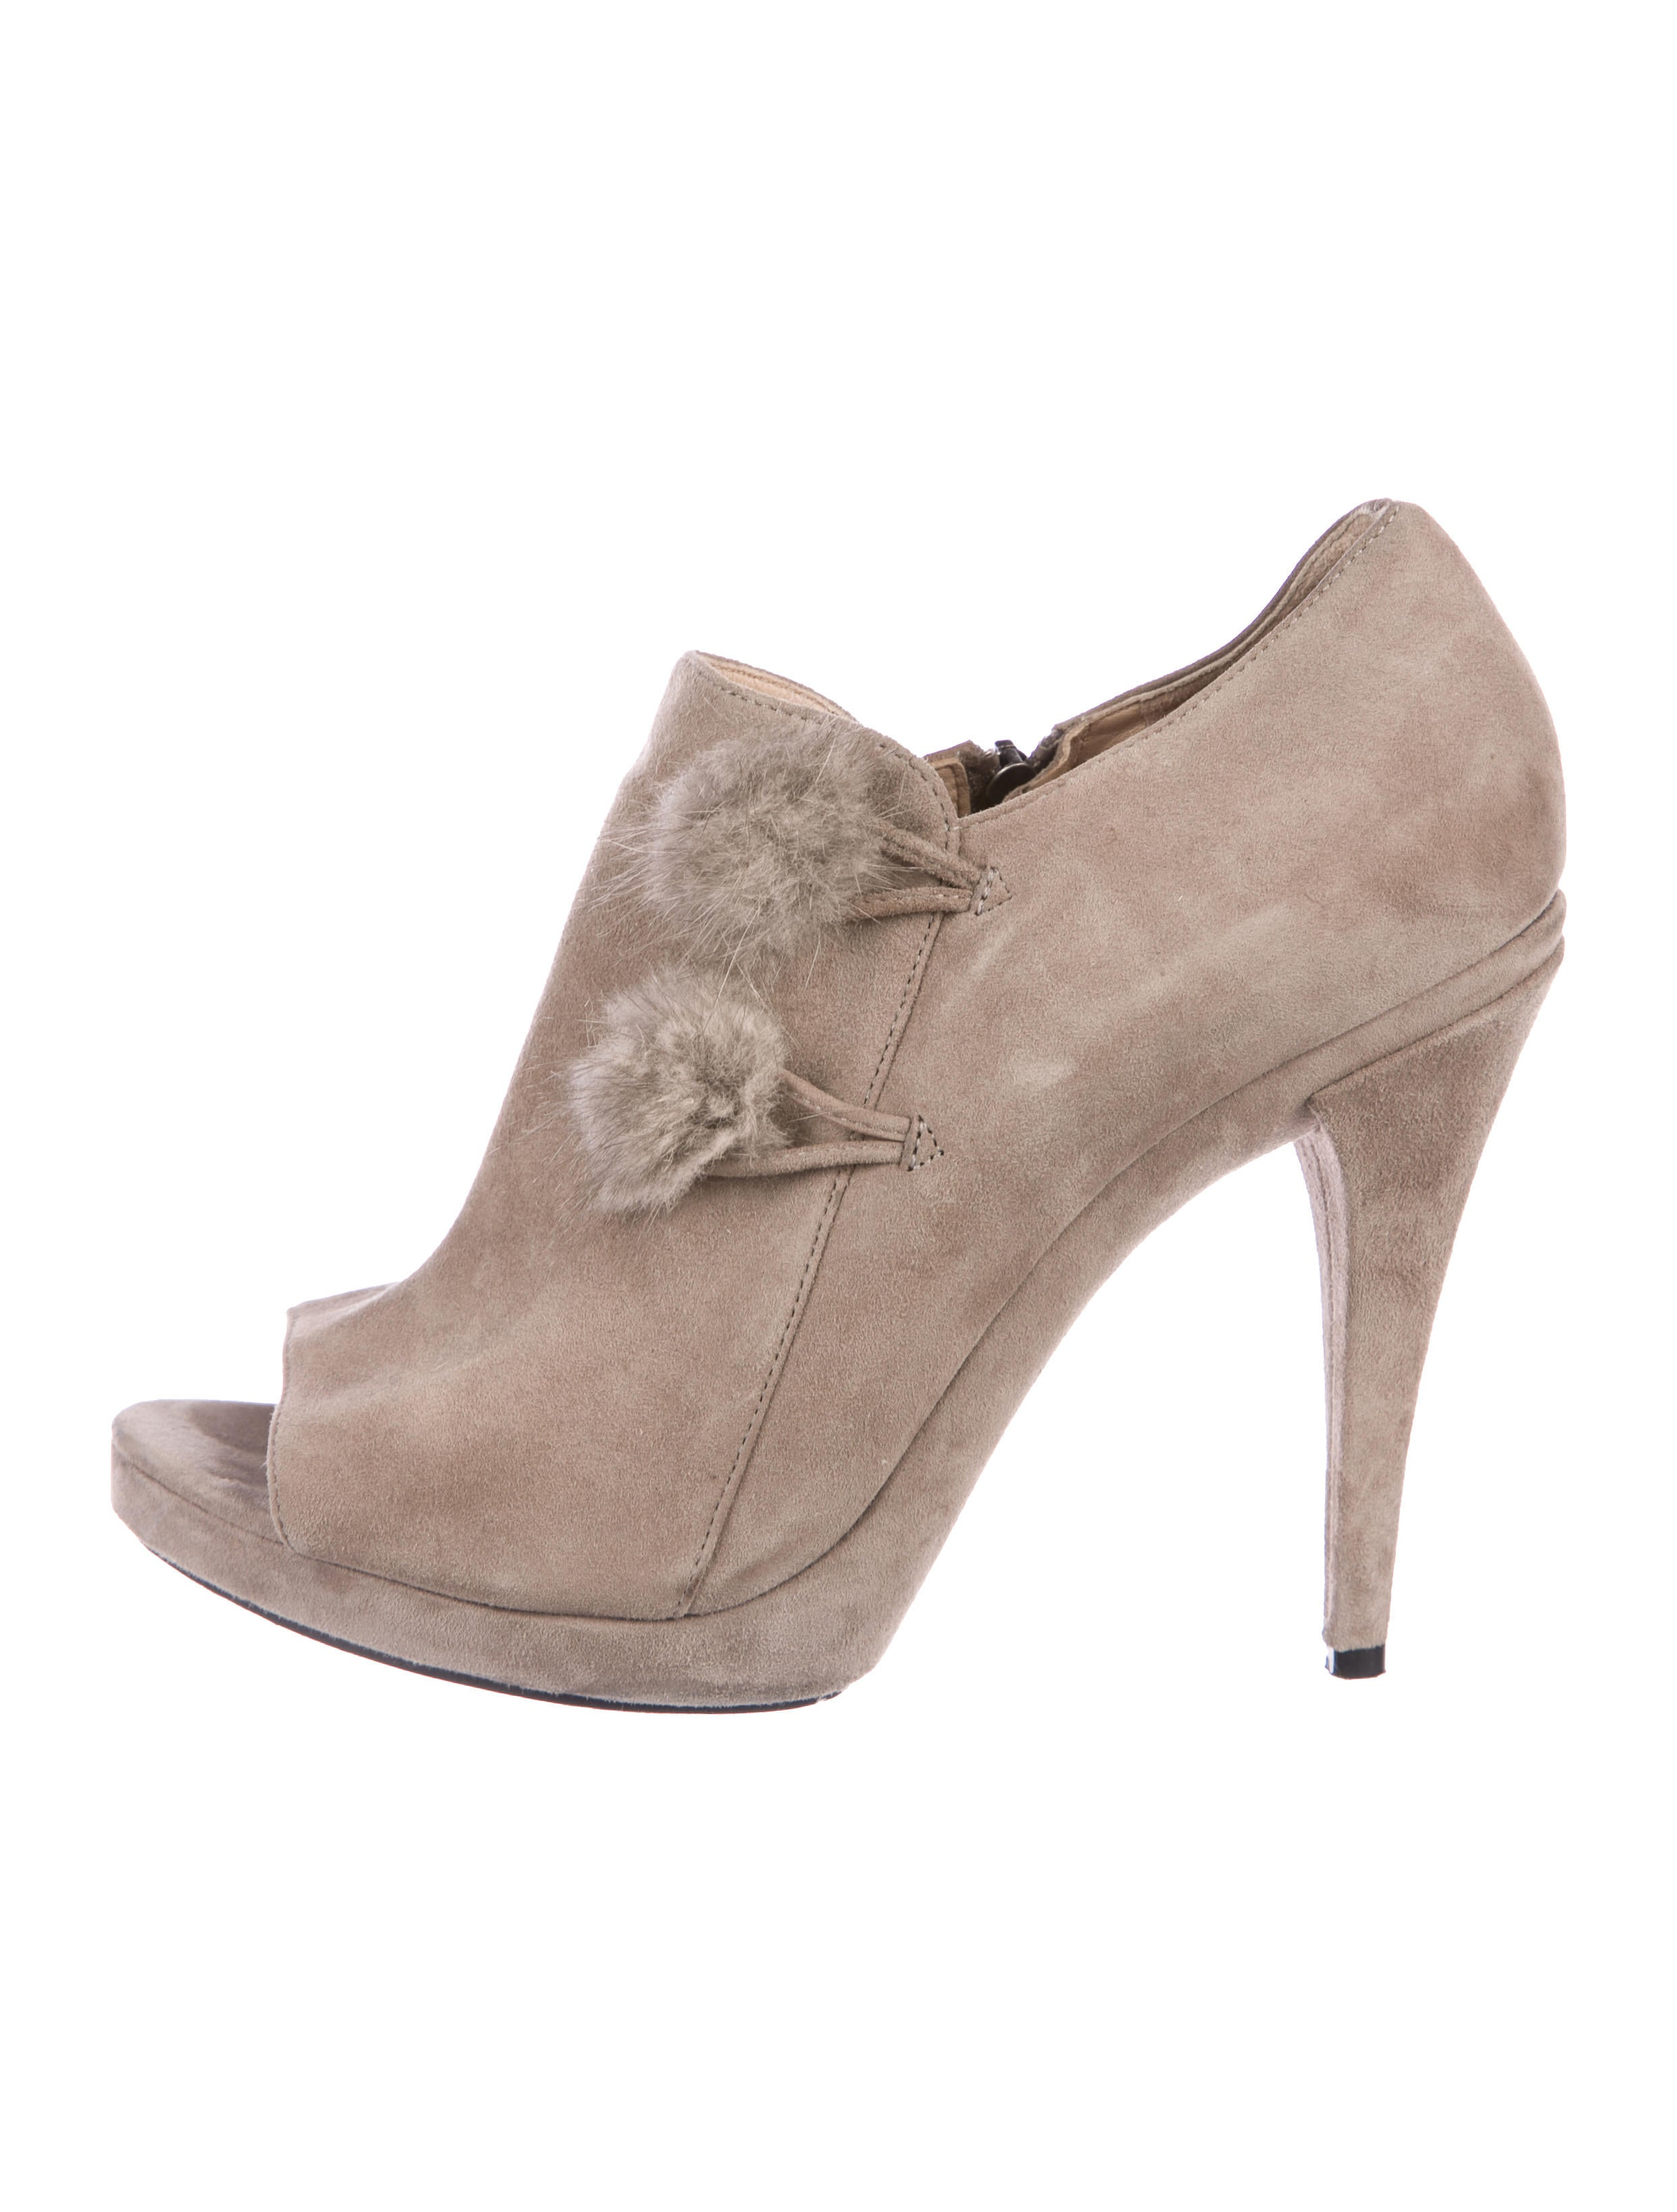 2014 sale online Via Spiga Fur-Accented Peep-Toe Booties footlocker online J94Vz0DzsE